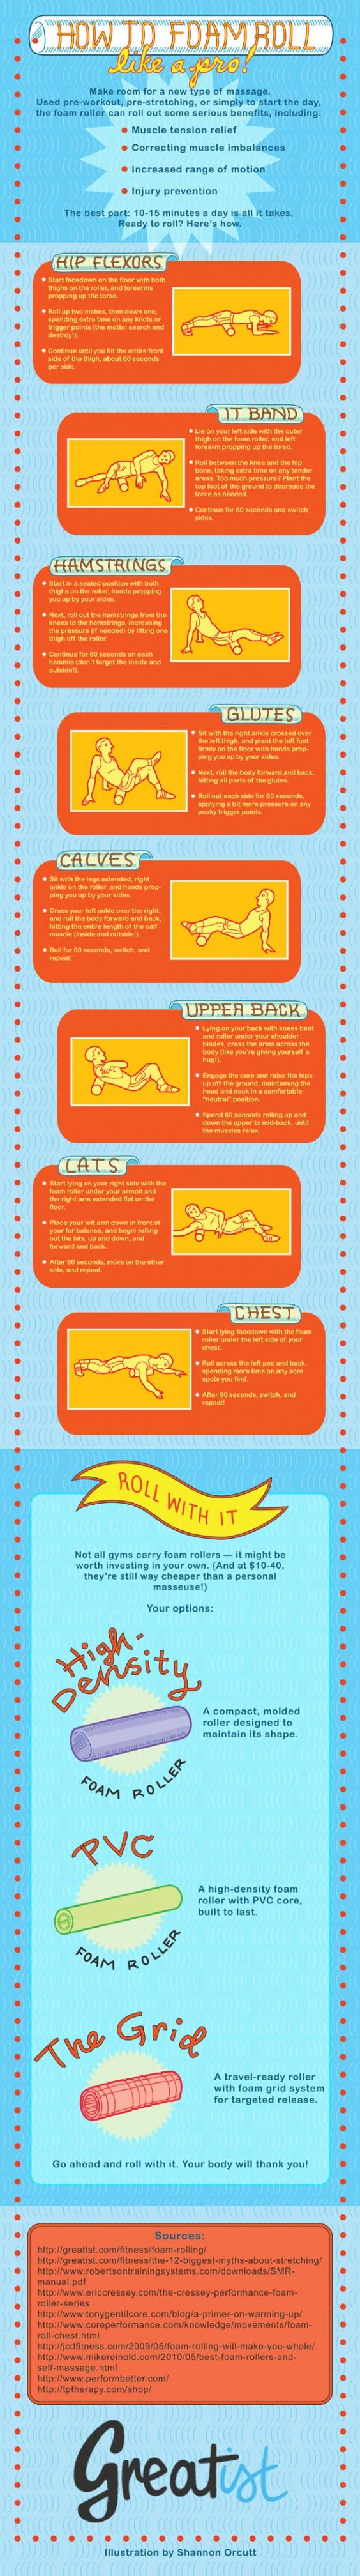 Foam Rolling Infographic